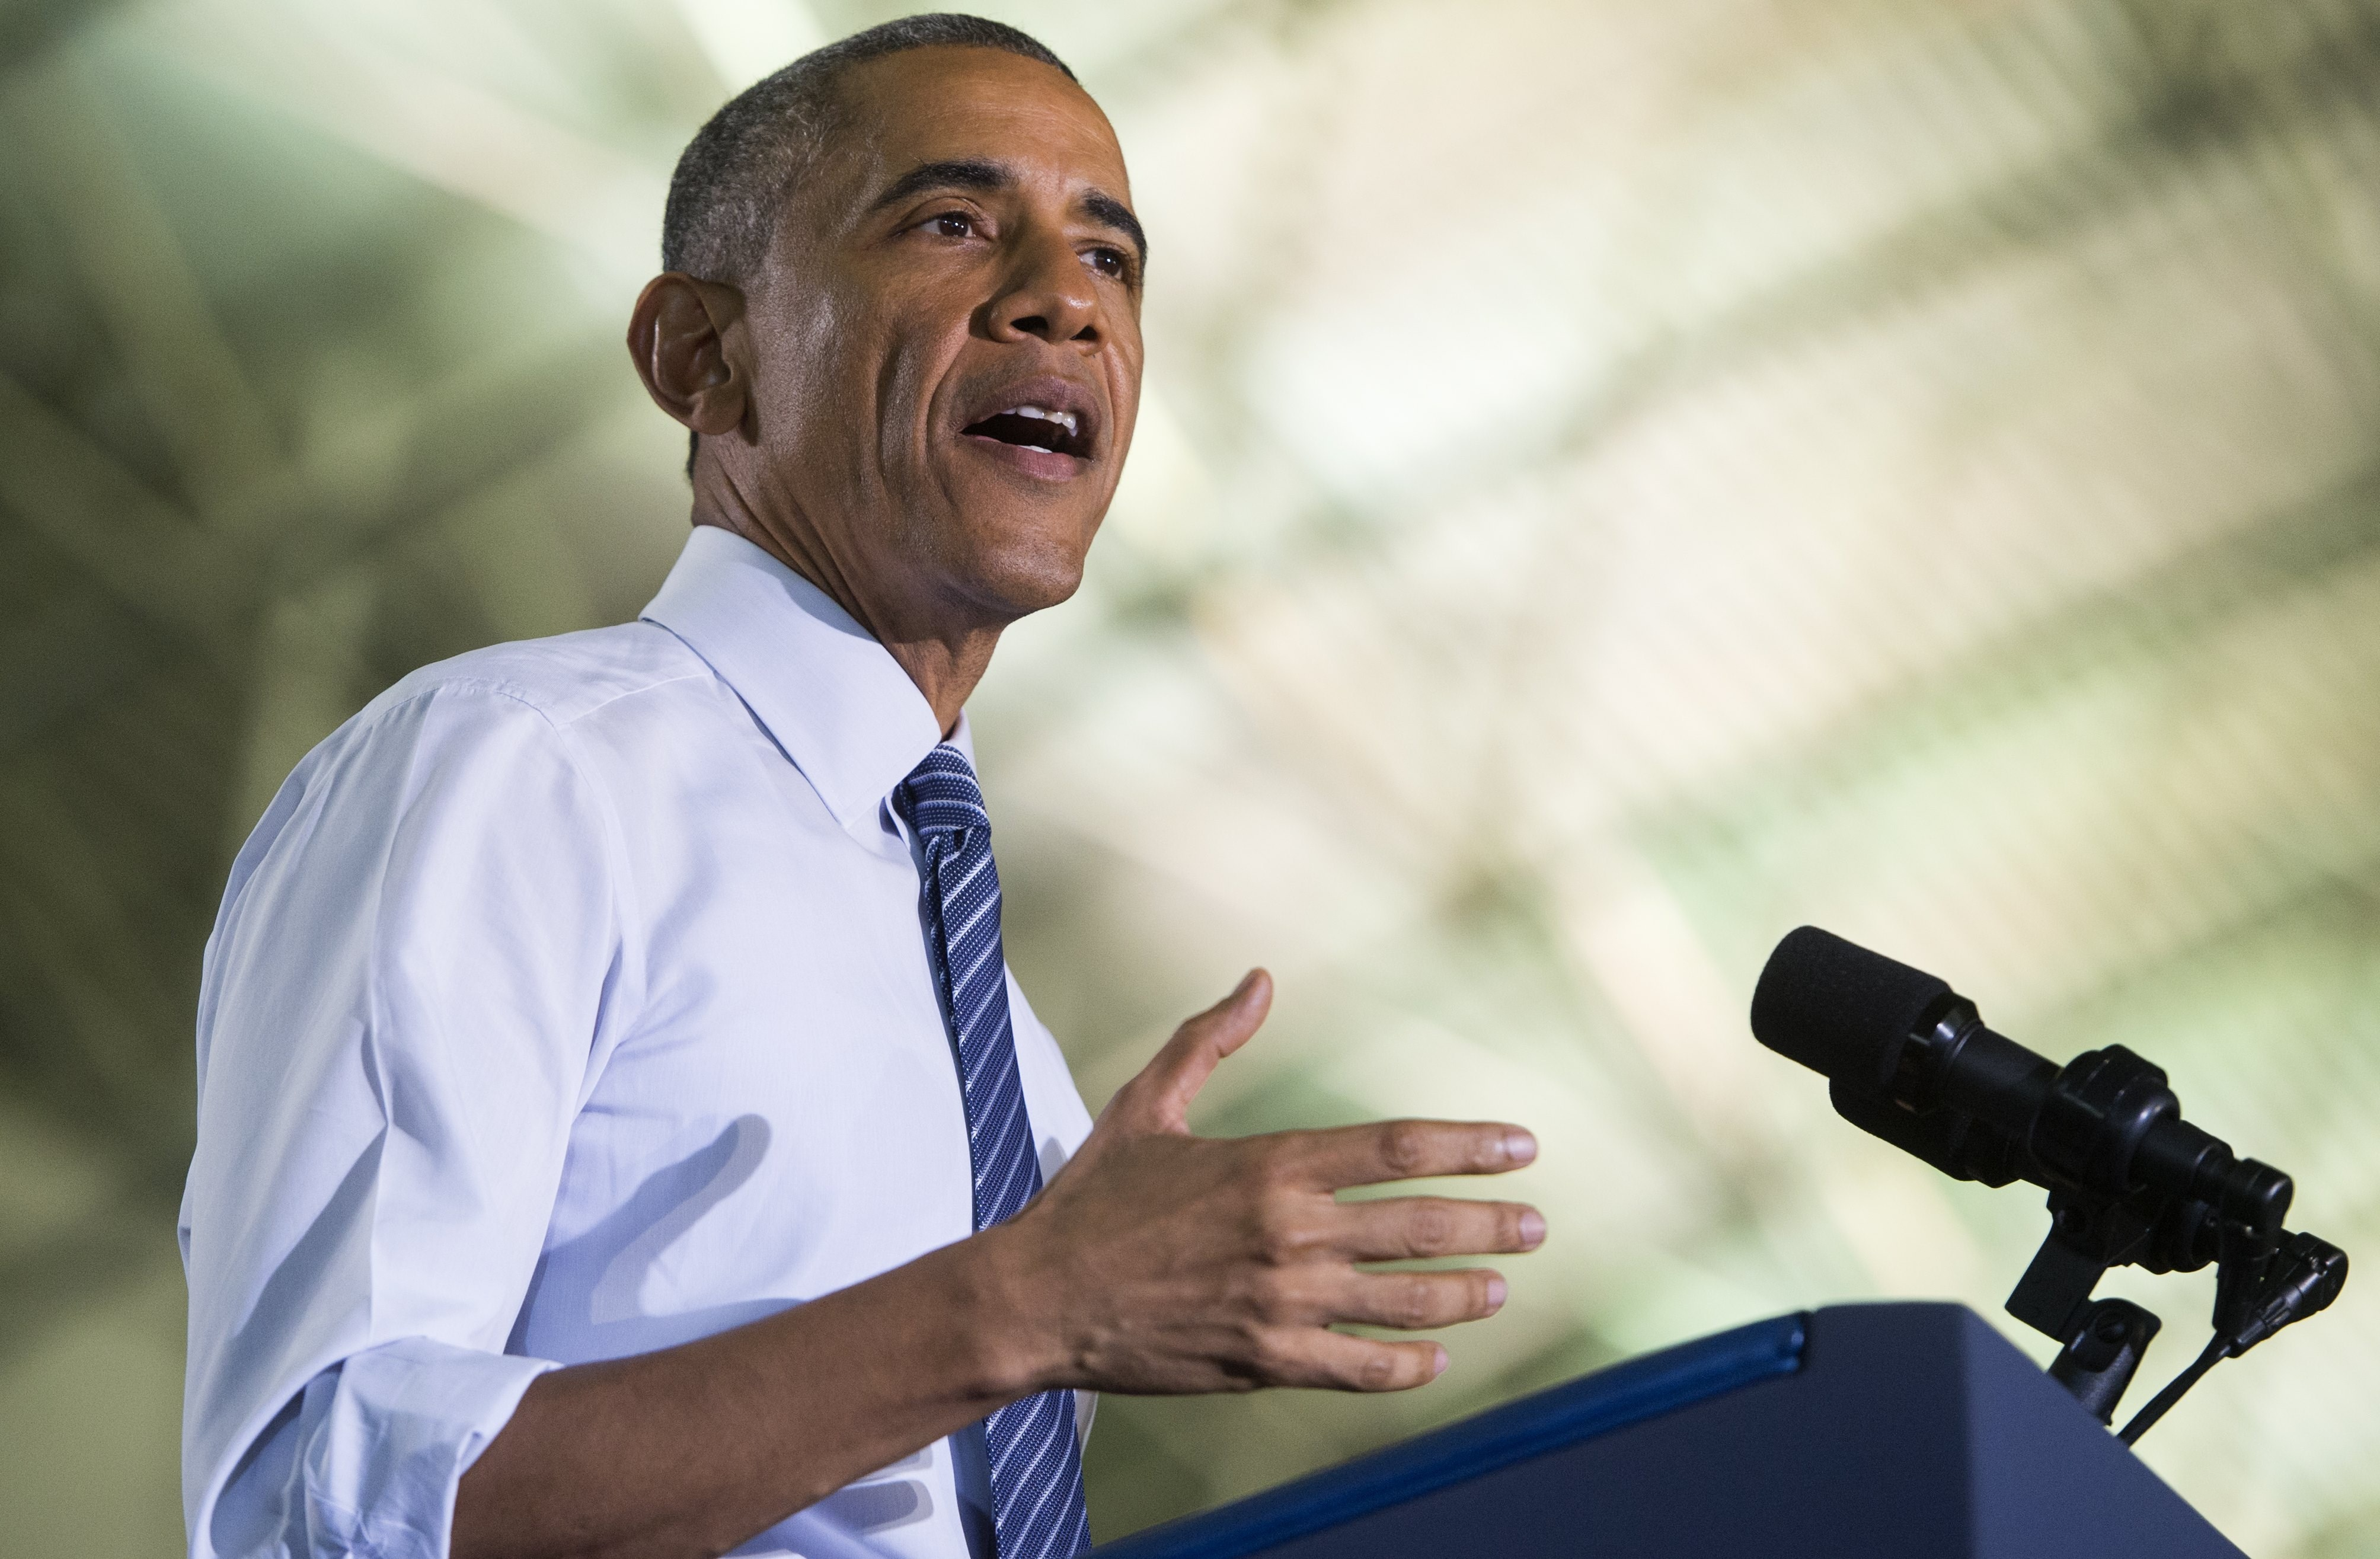 US President Barack Obama speaks  at Boise State University in Boise, Idaho on January 21, 2015. (Saul Loeb /AFP/Getty Images)